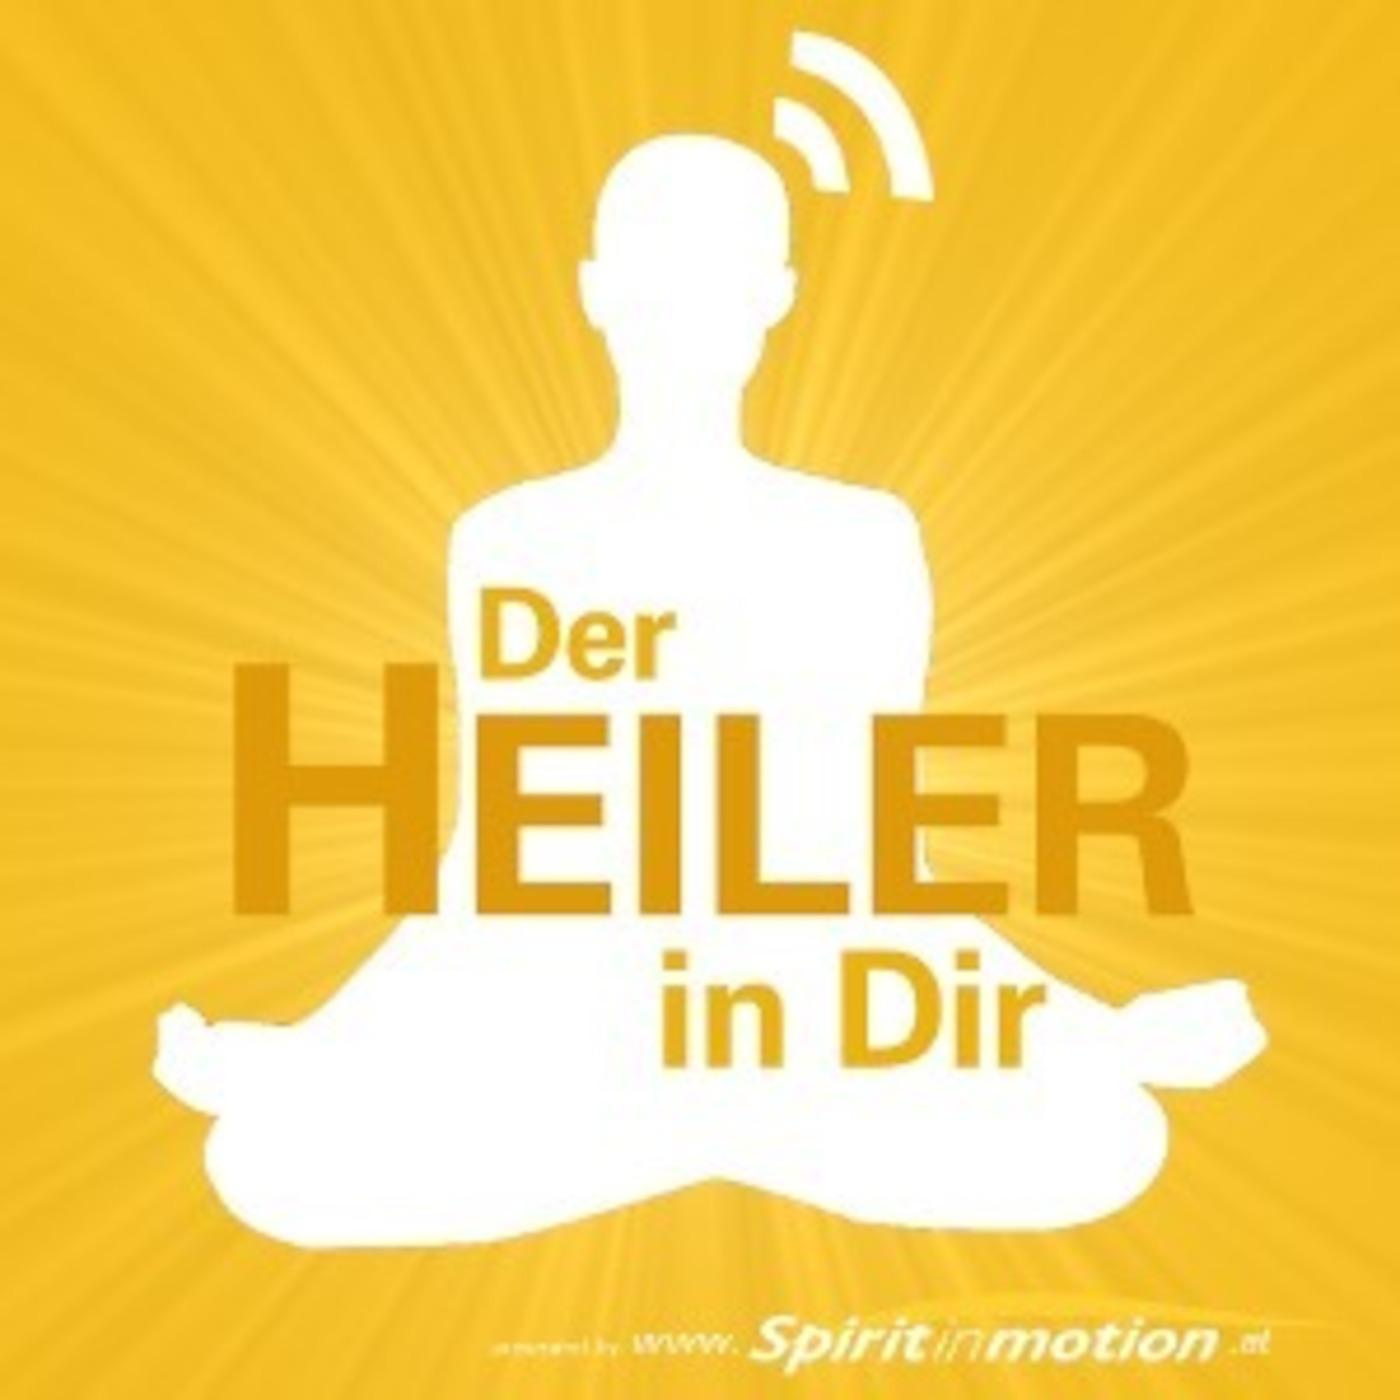 Podcast - Der Heiler in dir